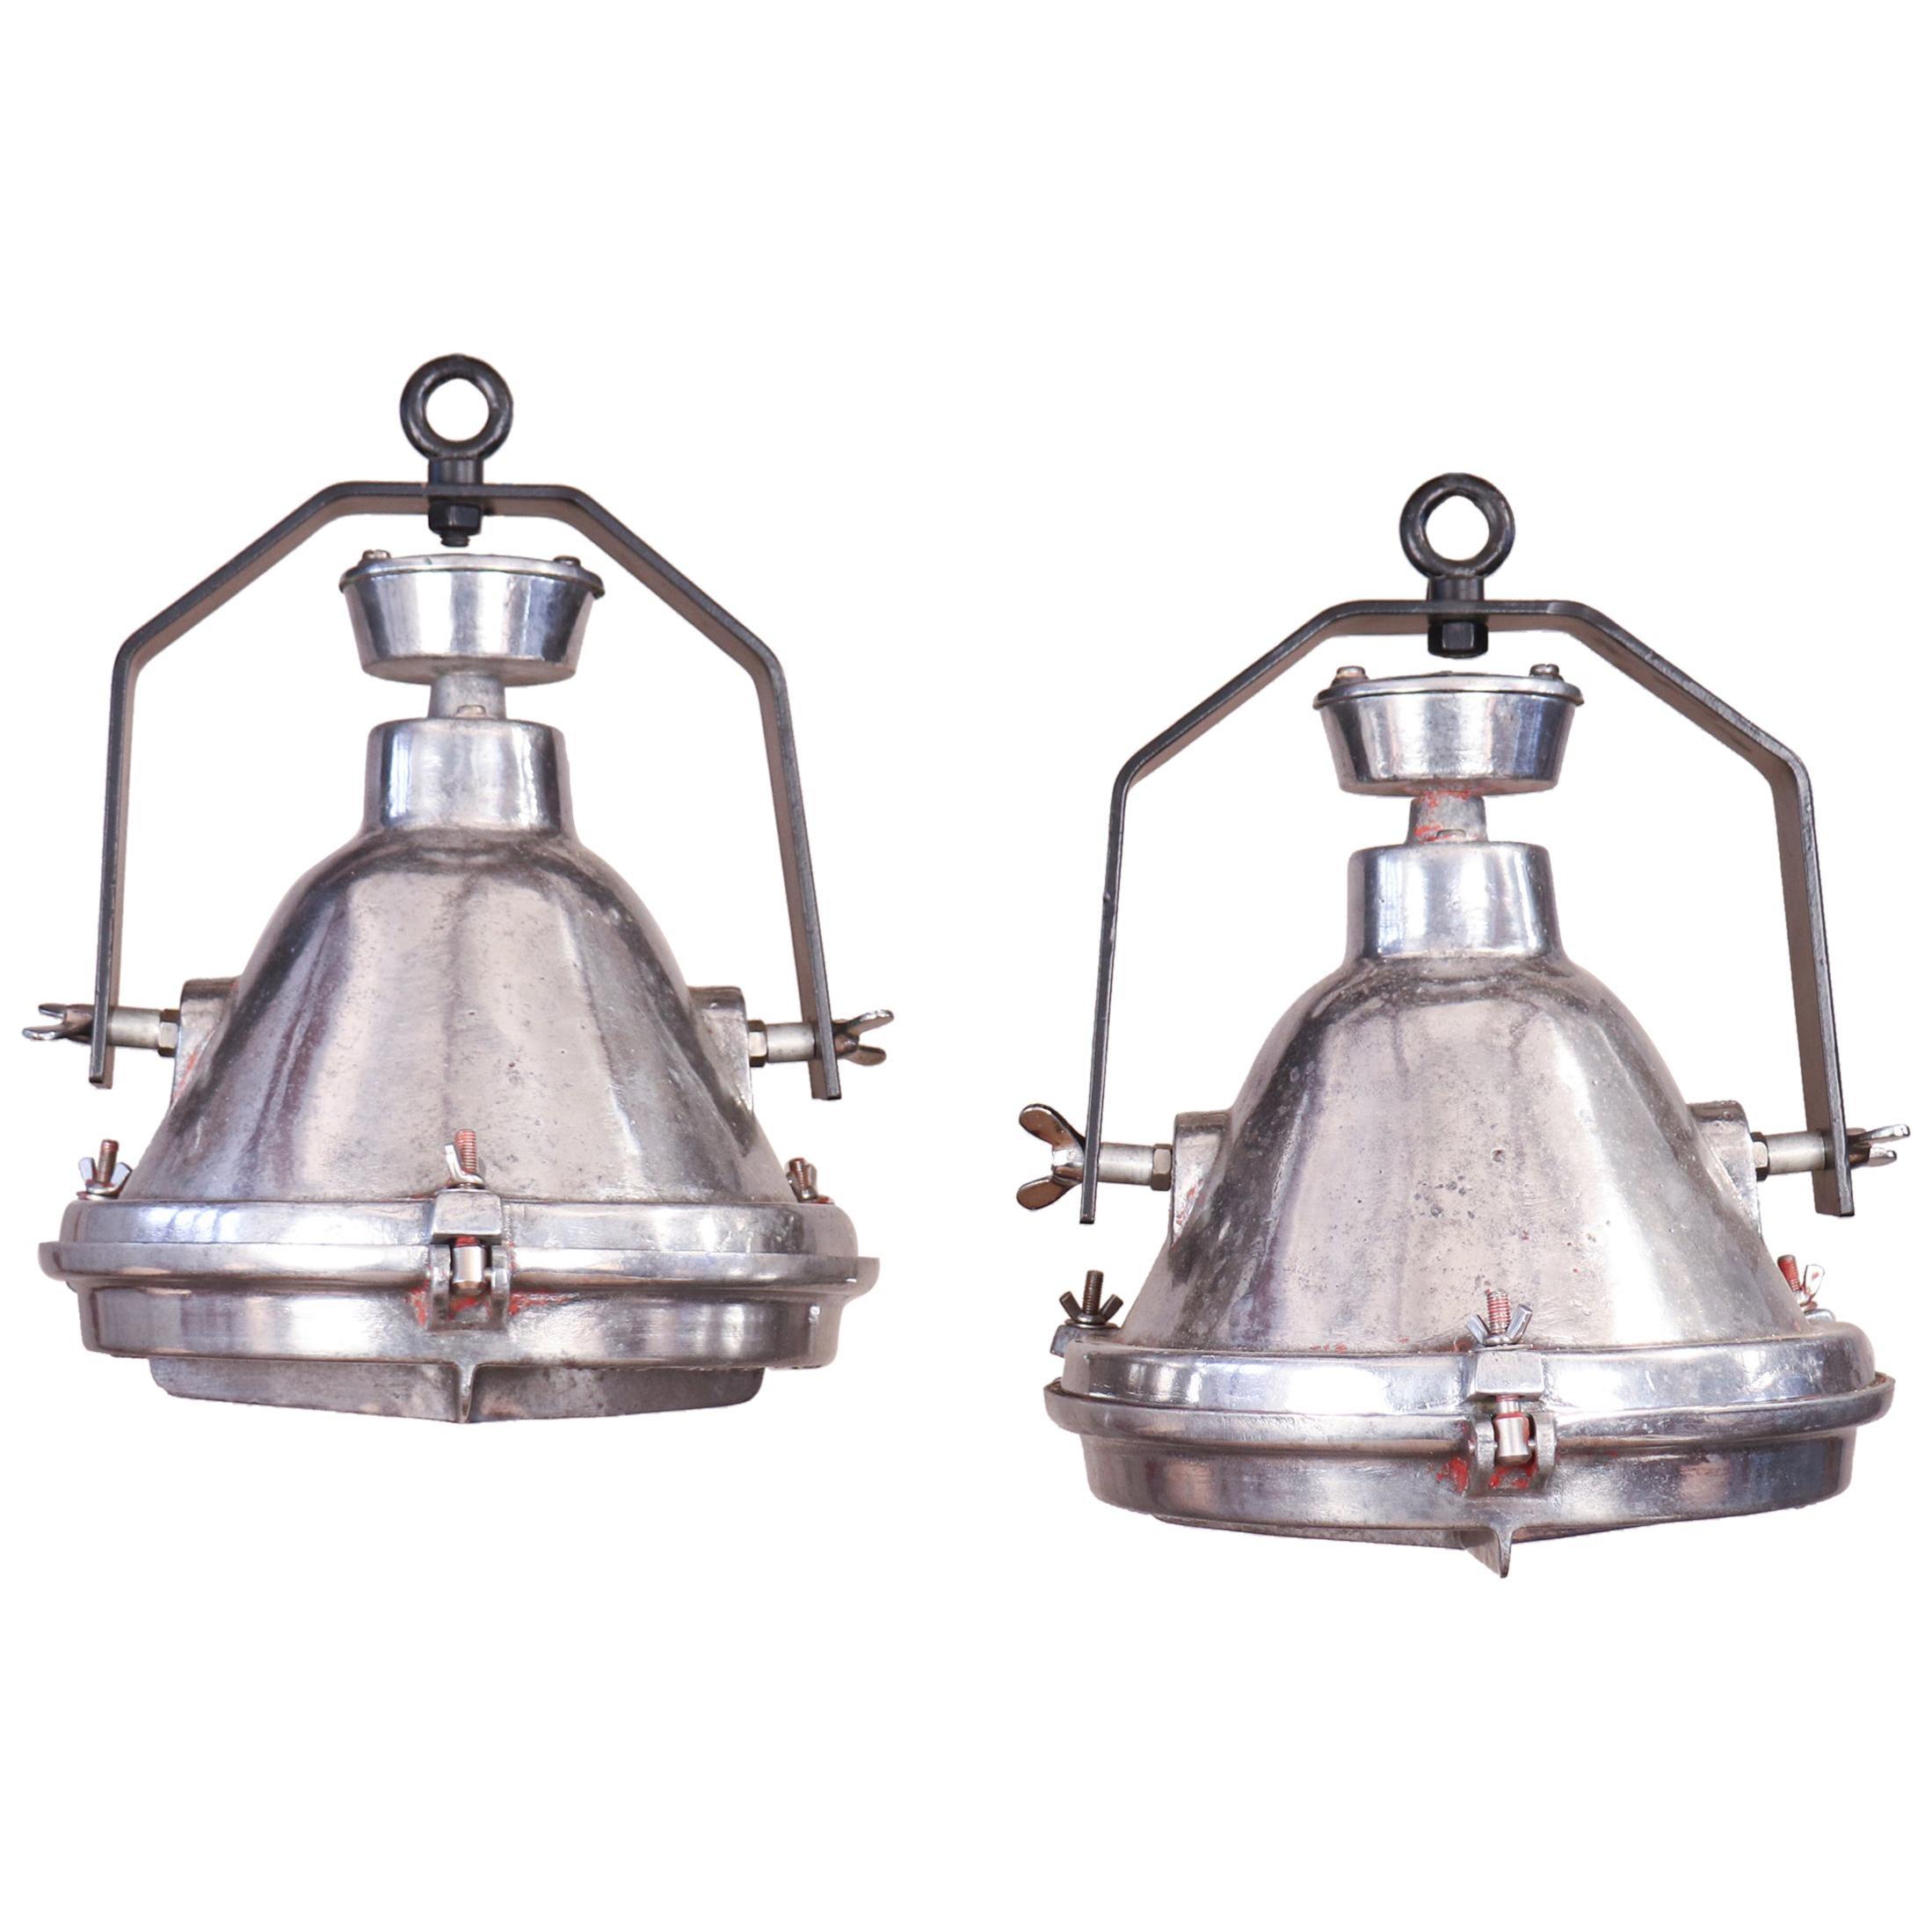 Pair of Vintage Industrial Aluminum Pendant Lights